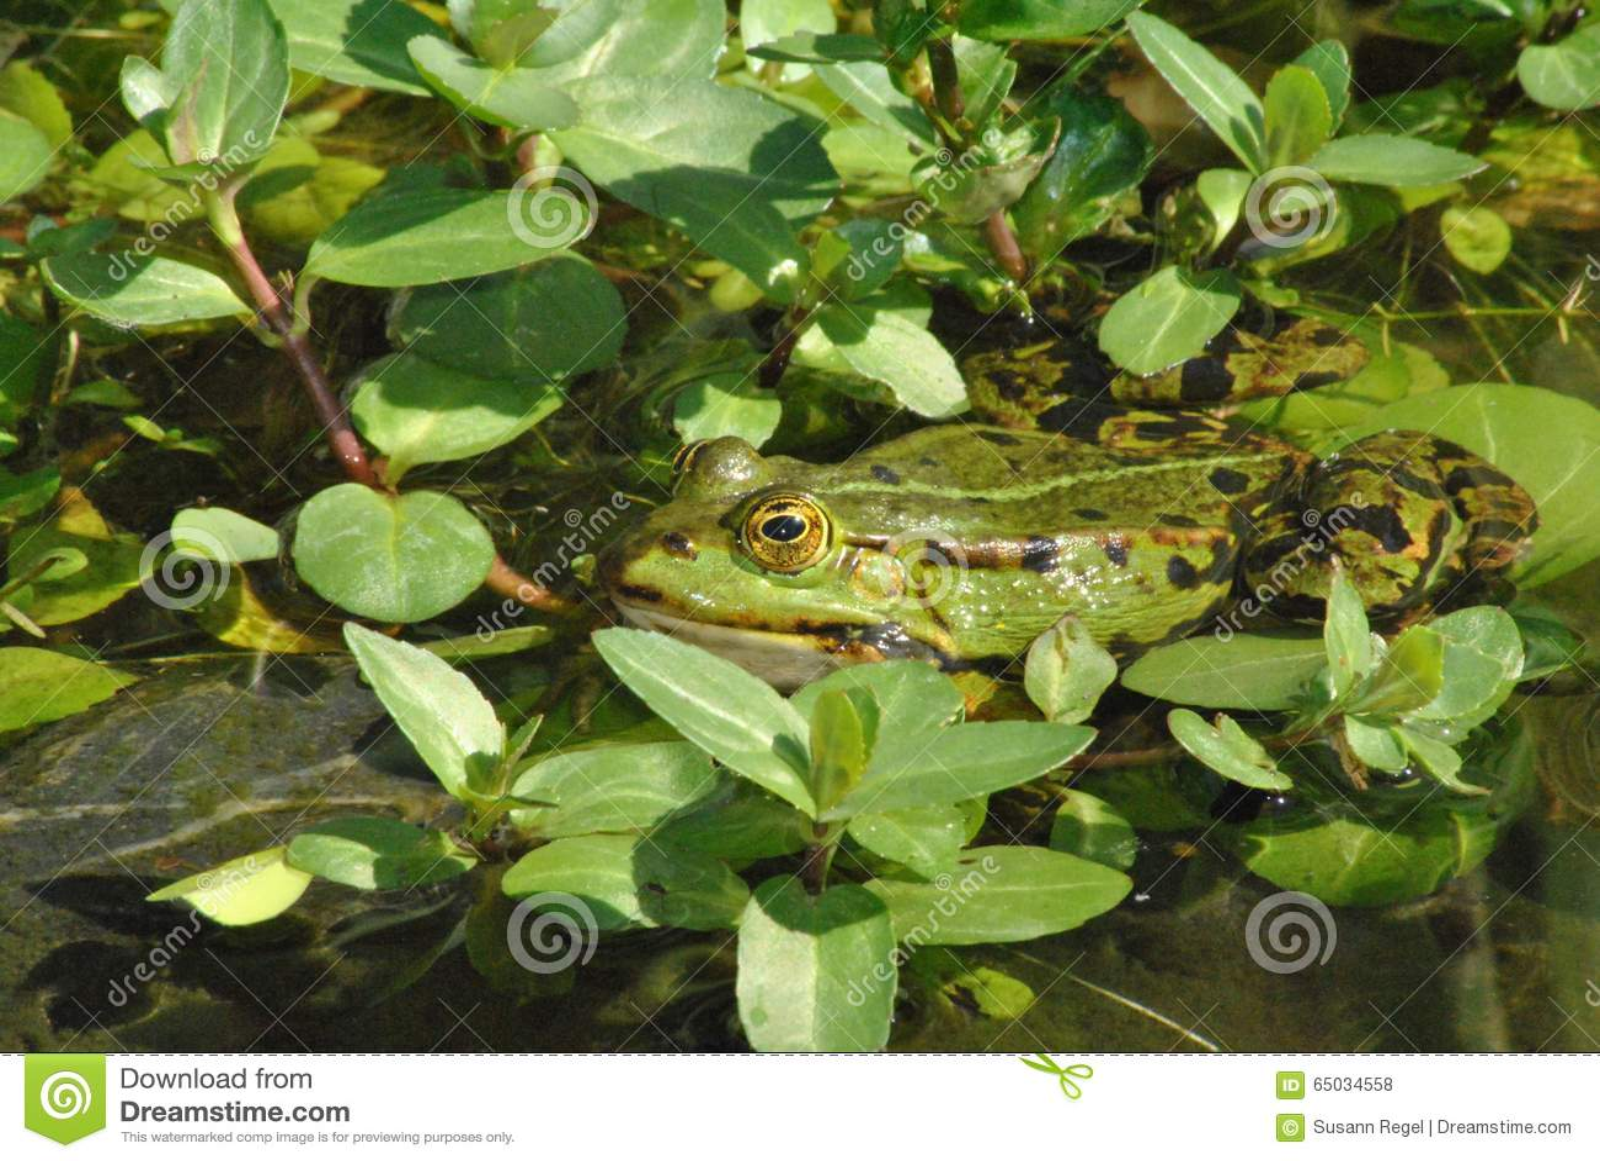 Grenouille verte entre le beccabunga de Veronica